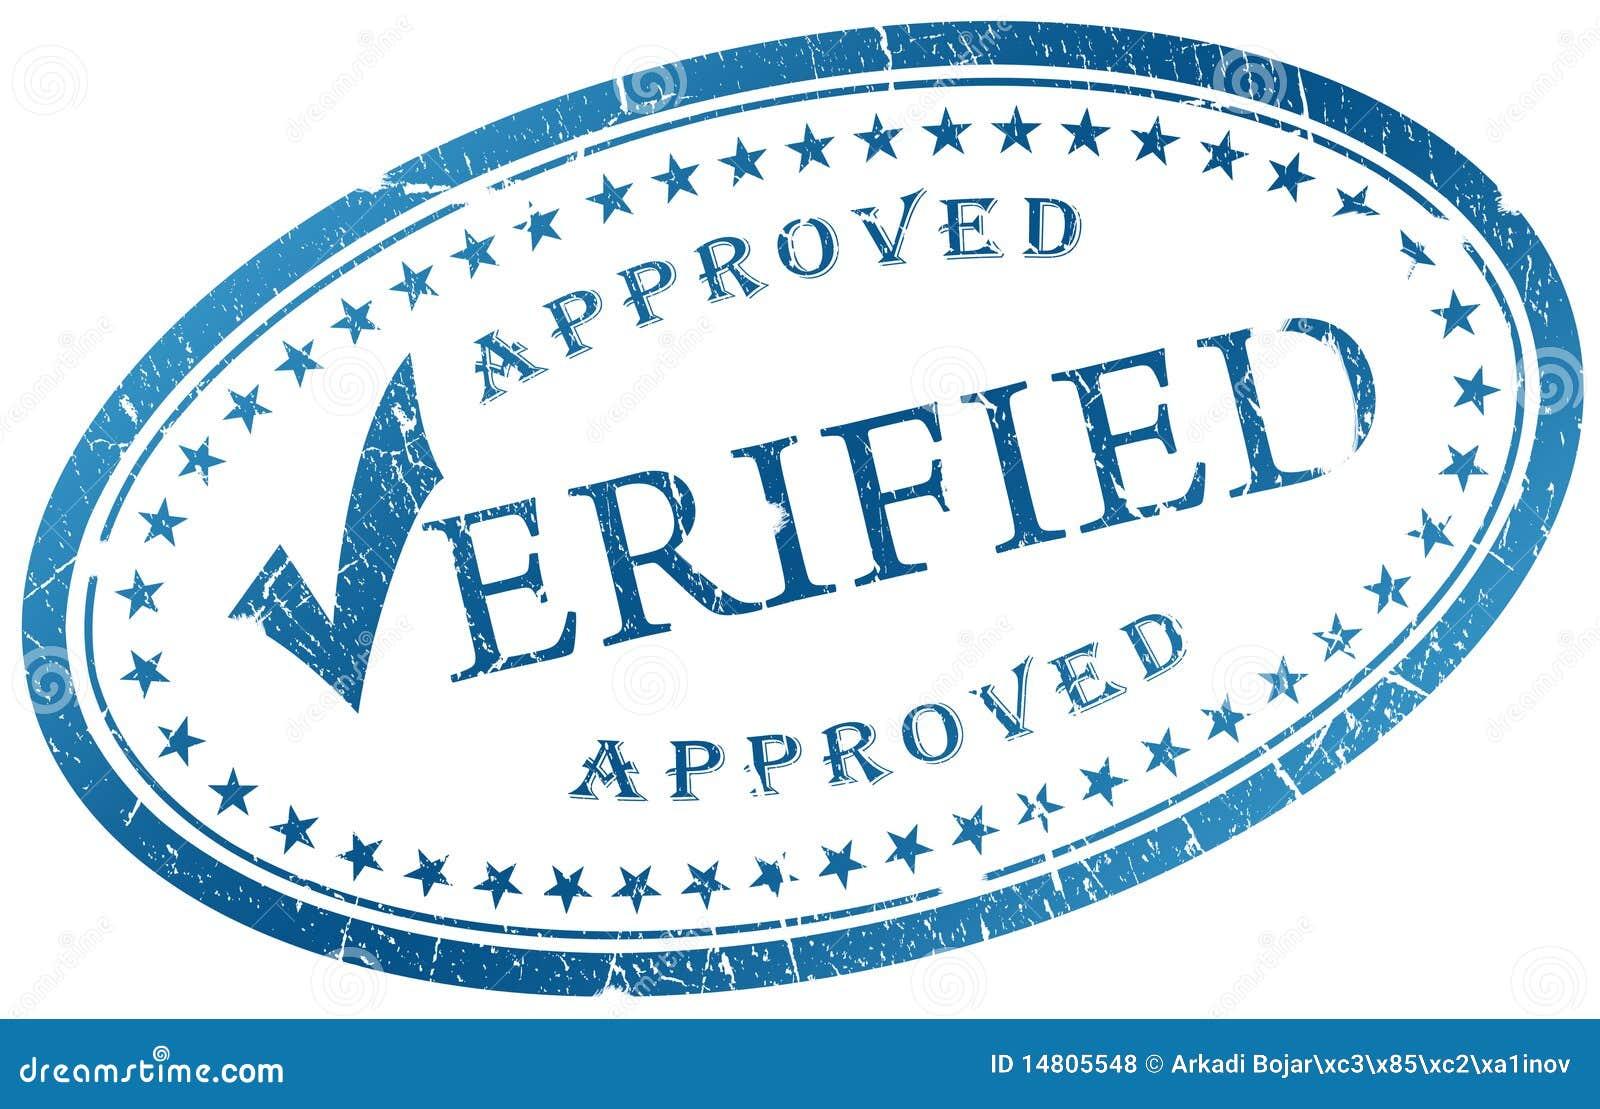 Verified stamp